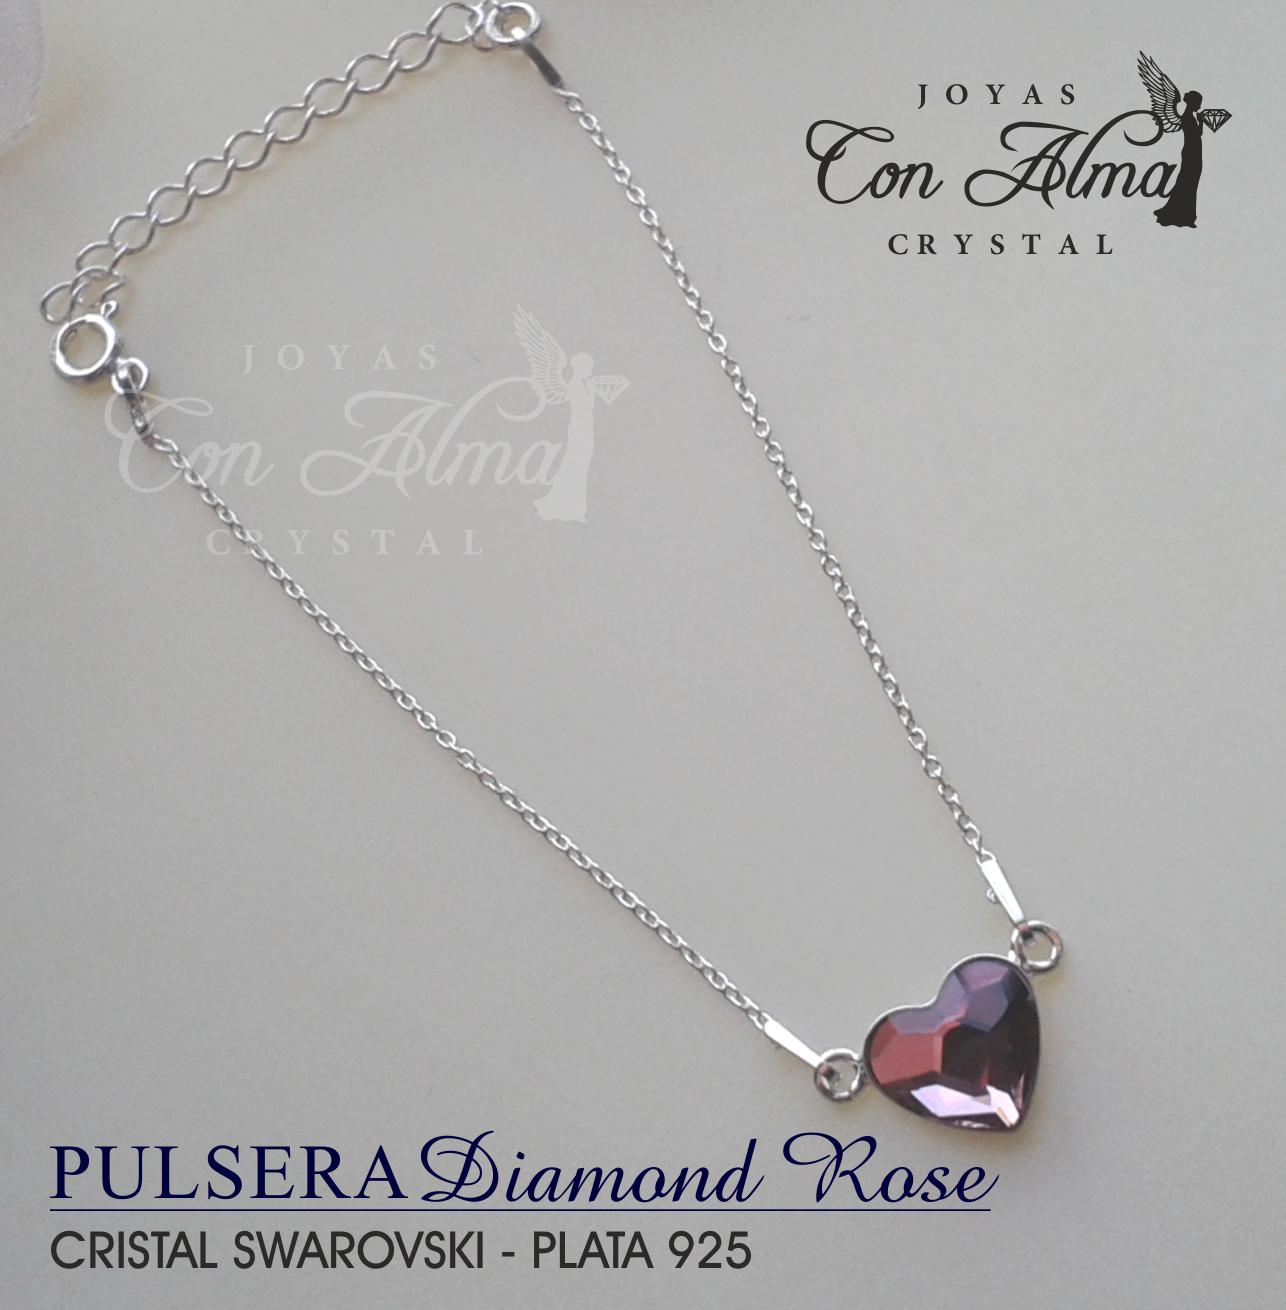 Pulsera Diamond Rose 25,99 €